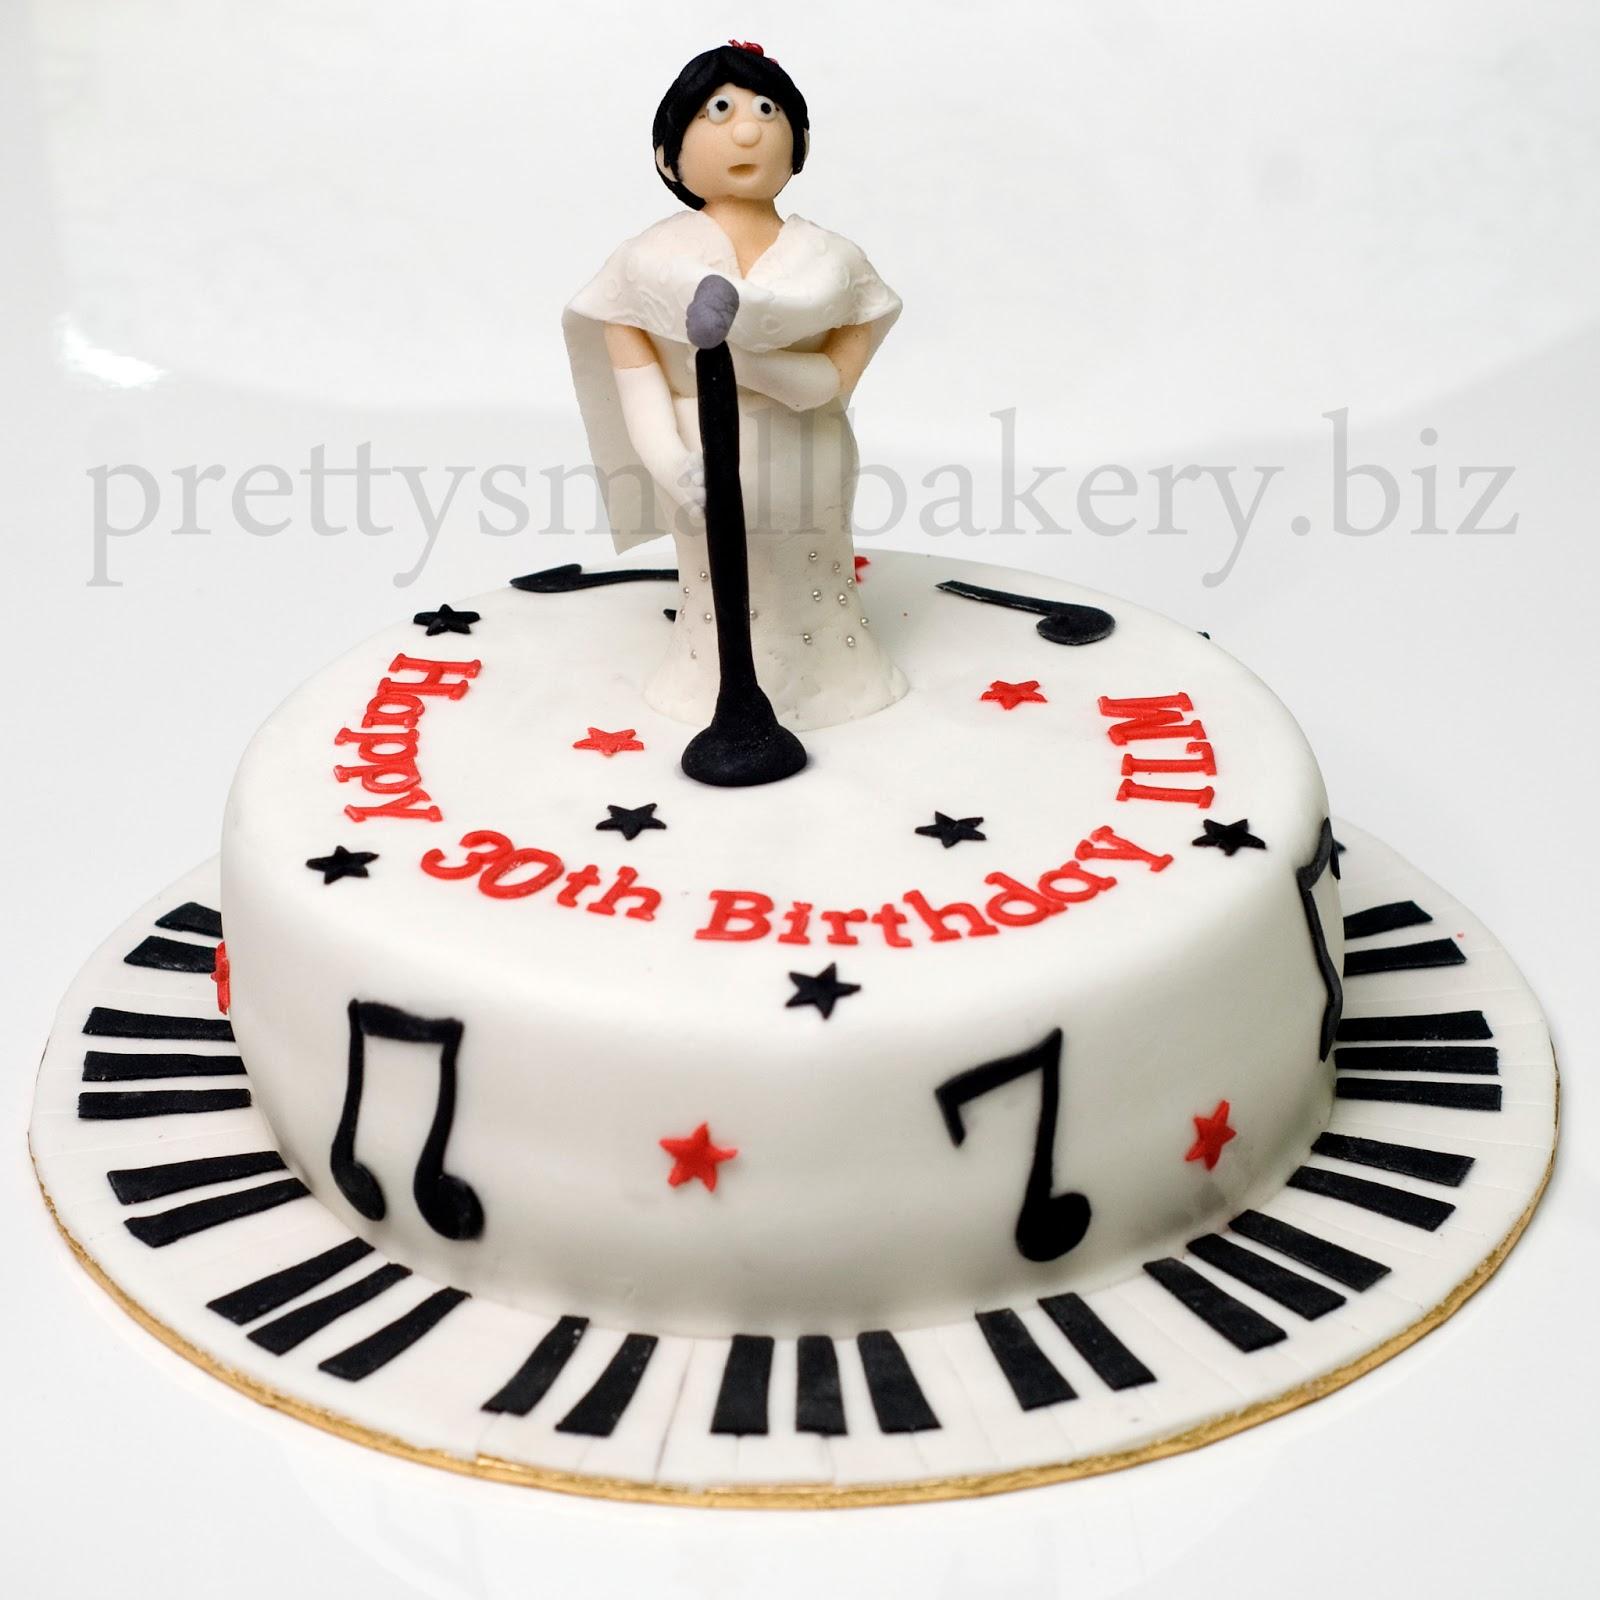 Kek Birthday Yang Unik She S An Artist Prettysmallbakery